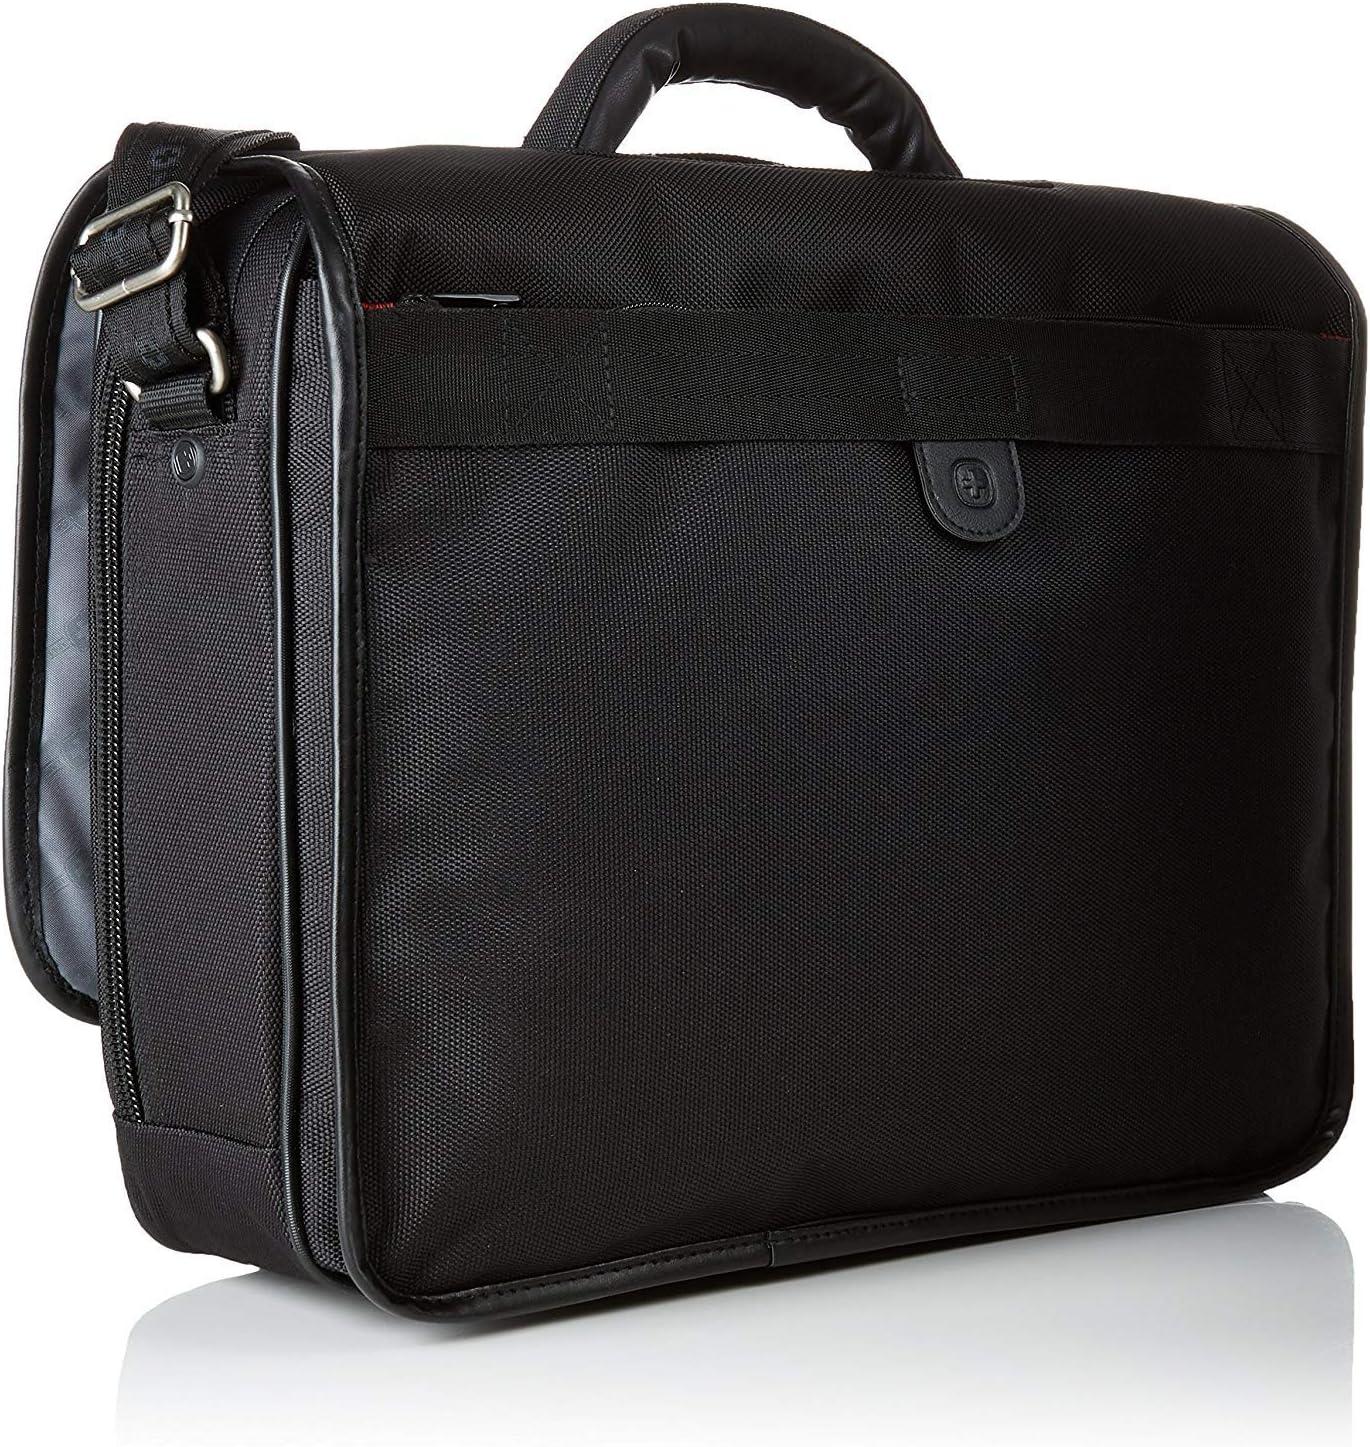 Wenger//SwissGear Flight Portfolio Black//Grey Model 67178140